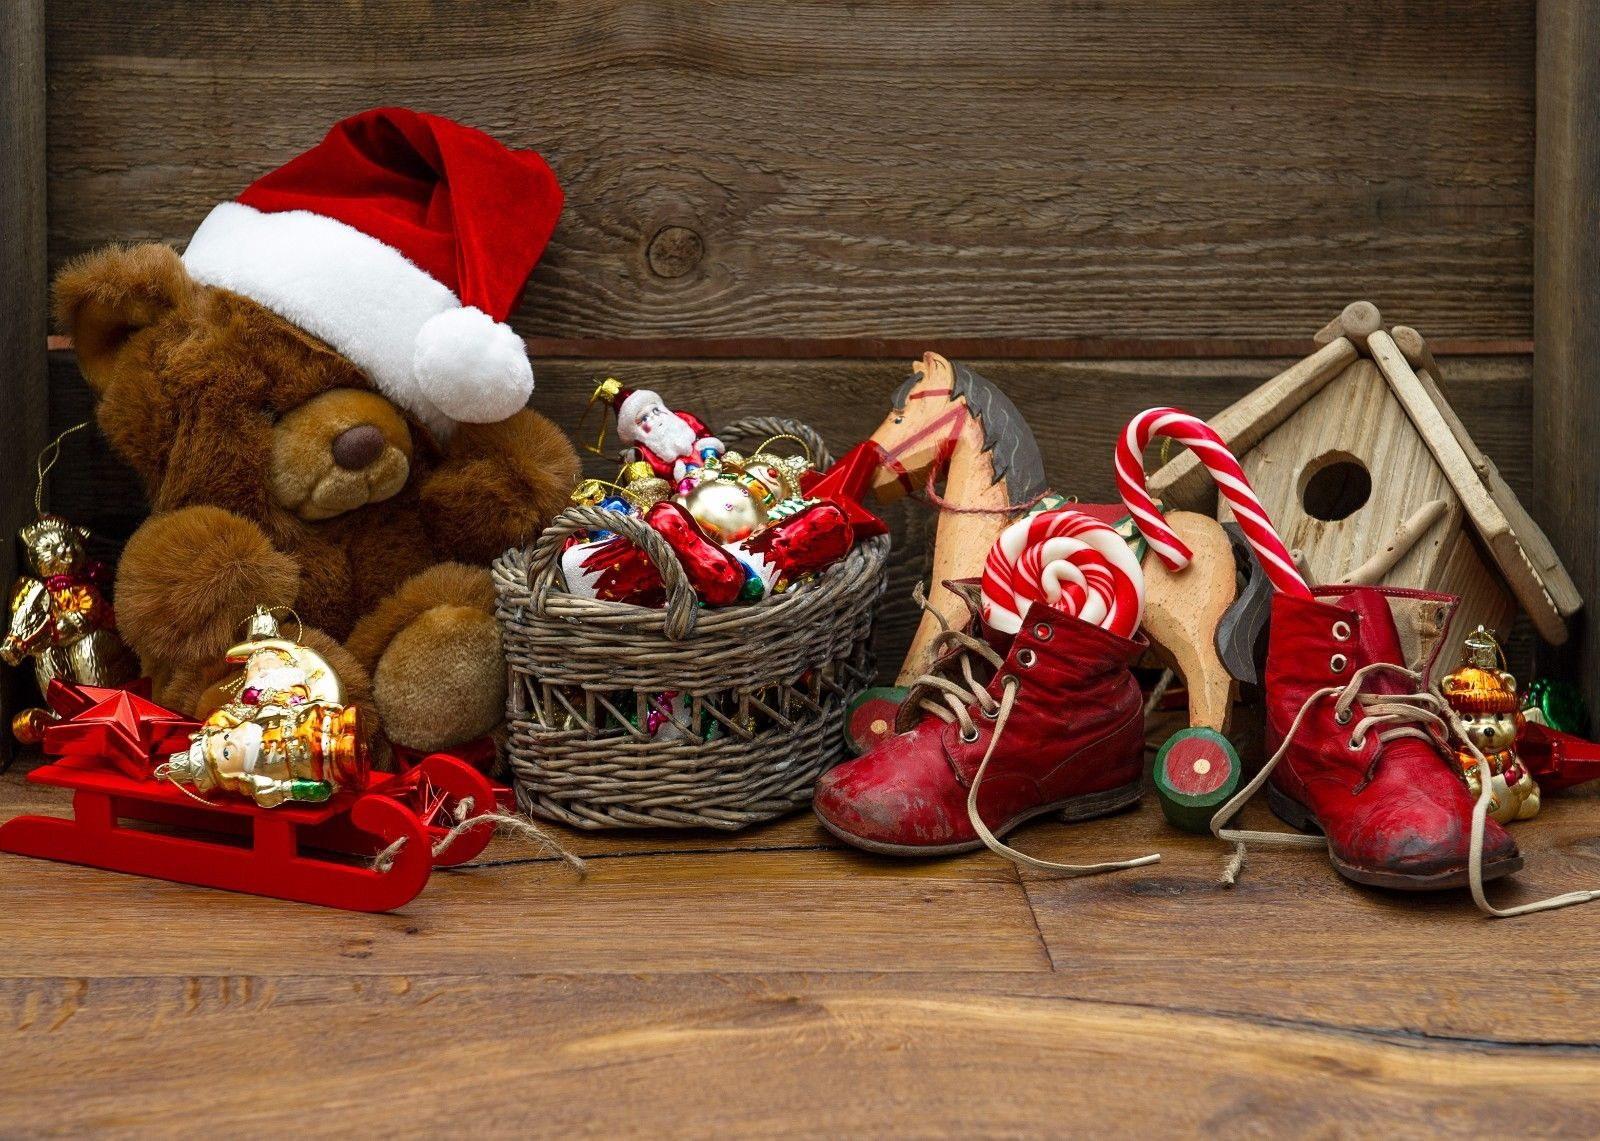 127349 Christmas year toys Decor WALL WALL WALL PRINT POSTER FR 9e54e9